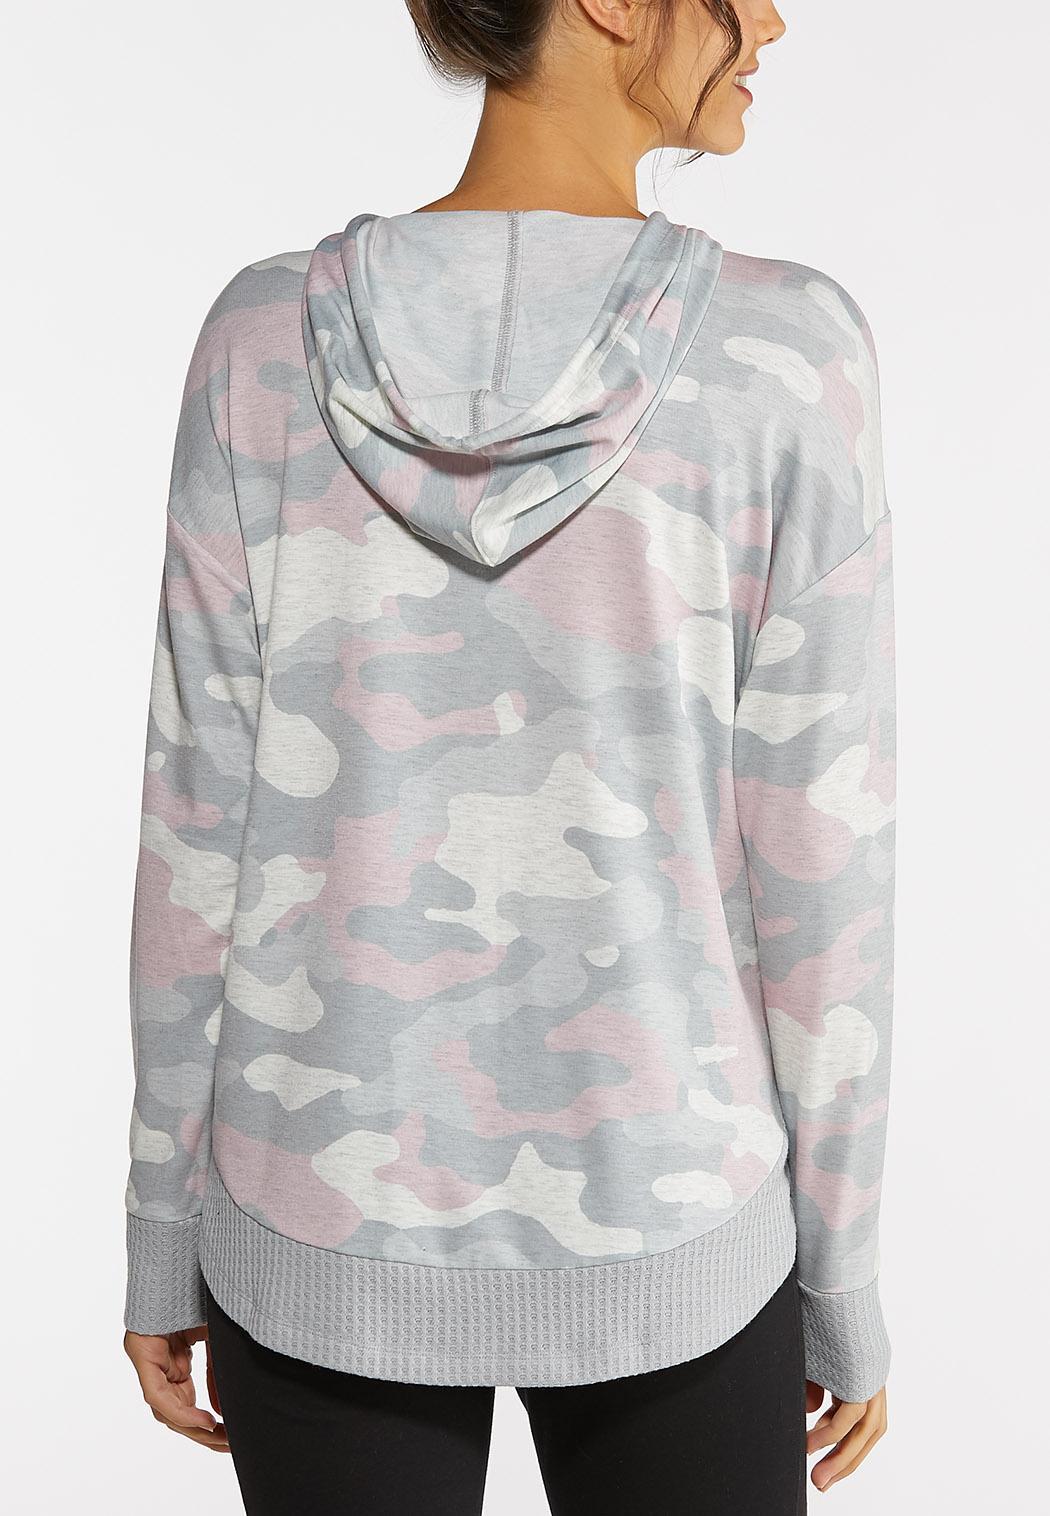 Blush Camo Sweatshirt (Item #44006014)